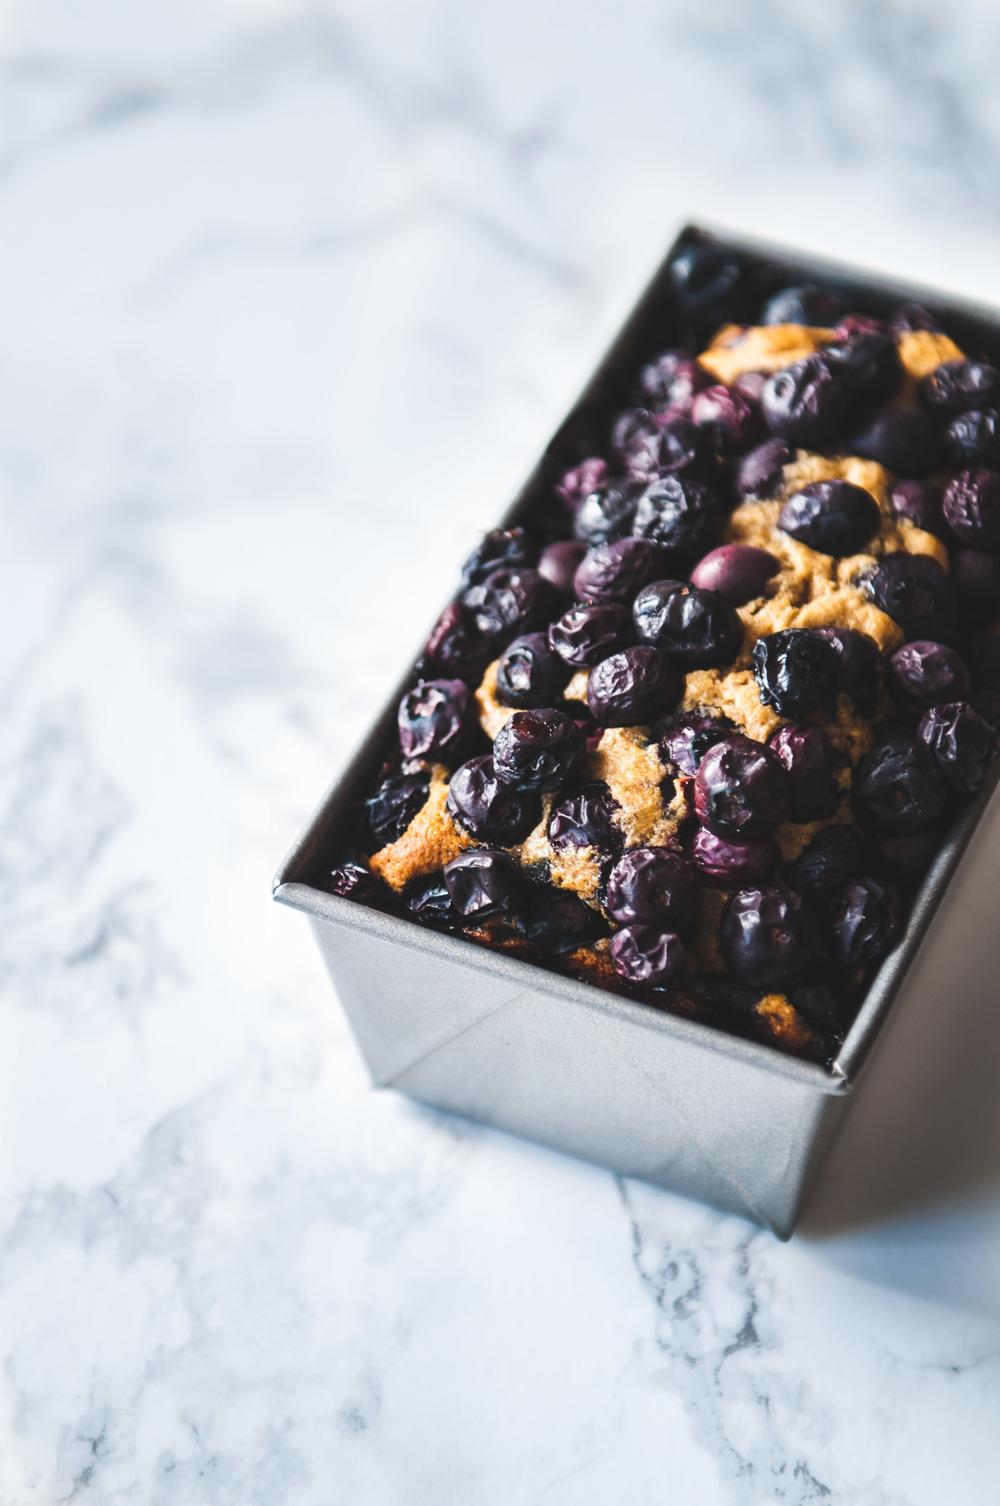 GLUTEN FREE BLUEBERRY POUND CAKE